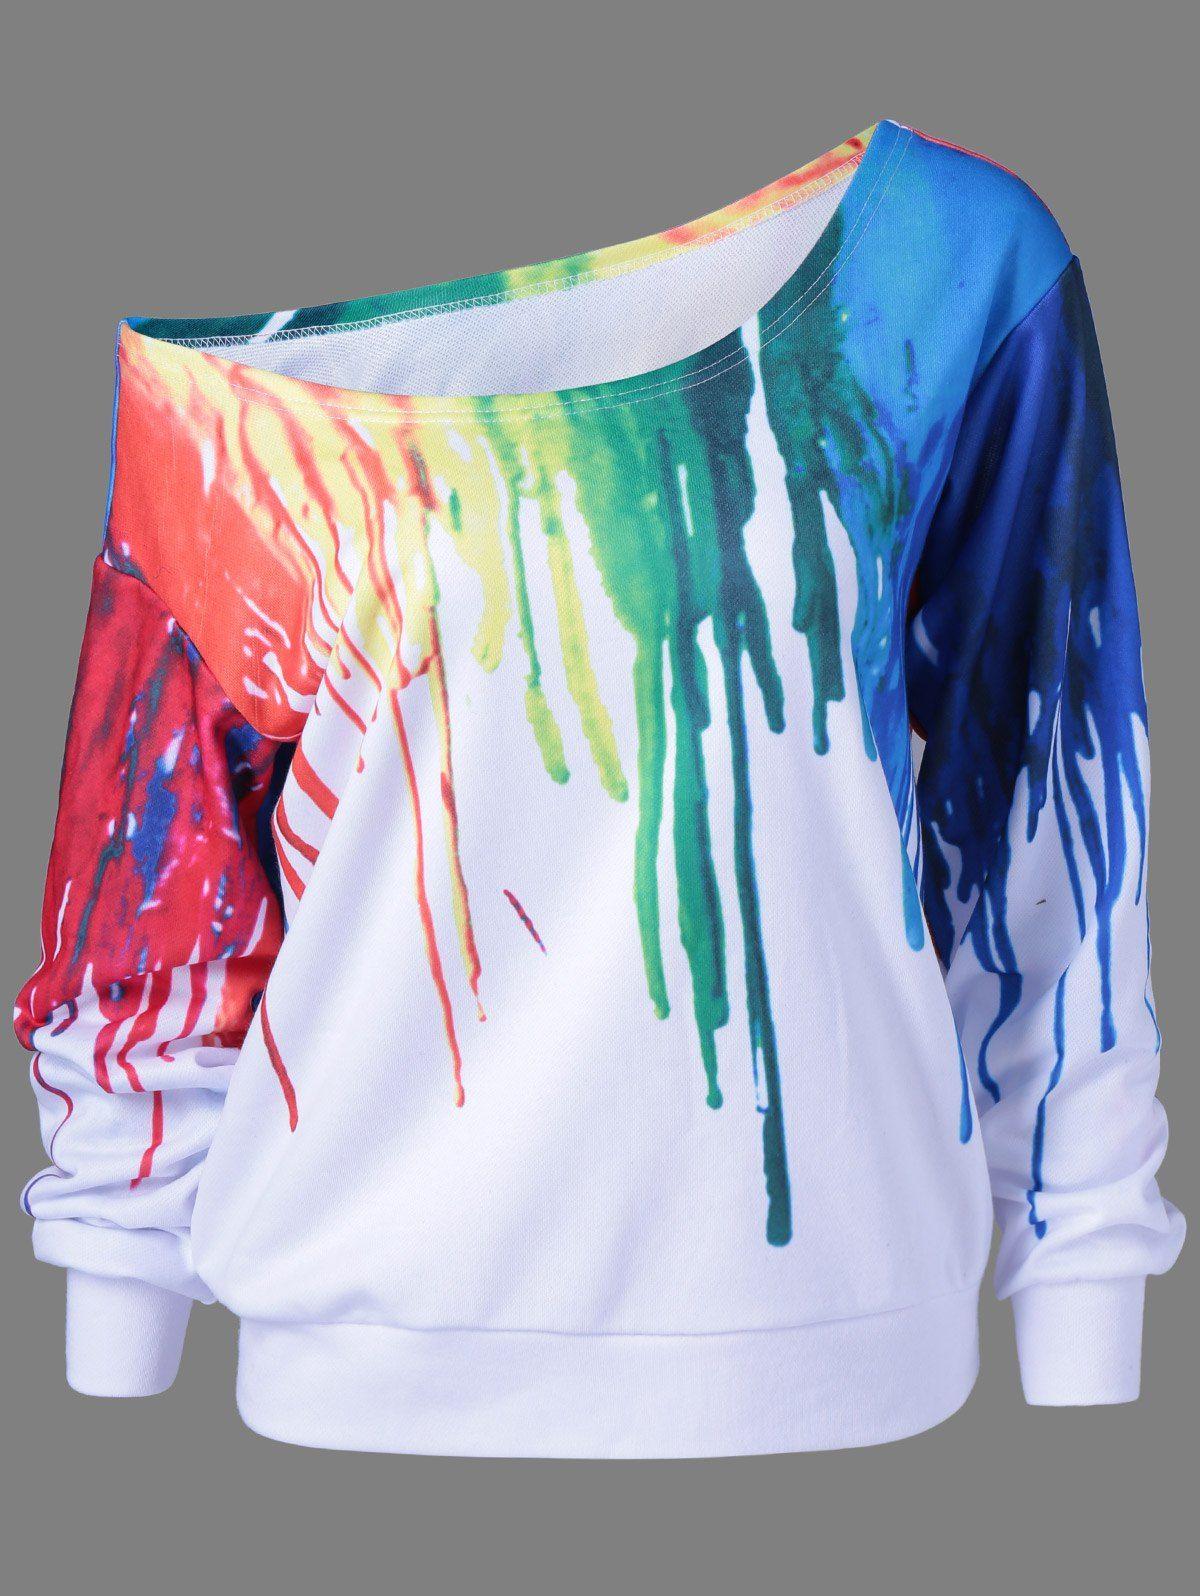 Share Get It Free Paint Drip Design Skew Collar Sweatshirtfor